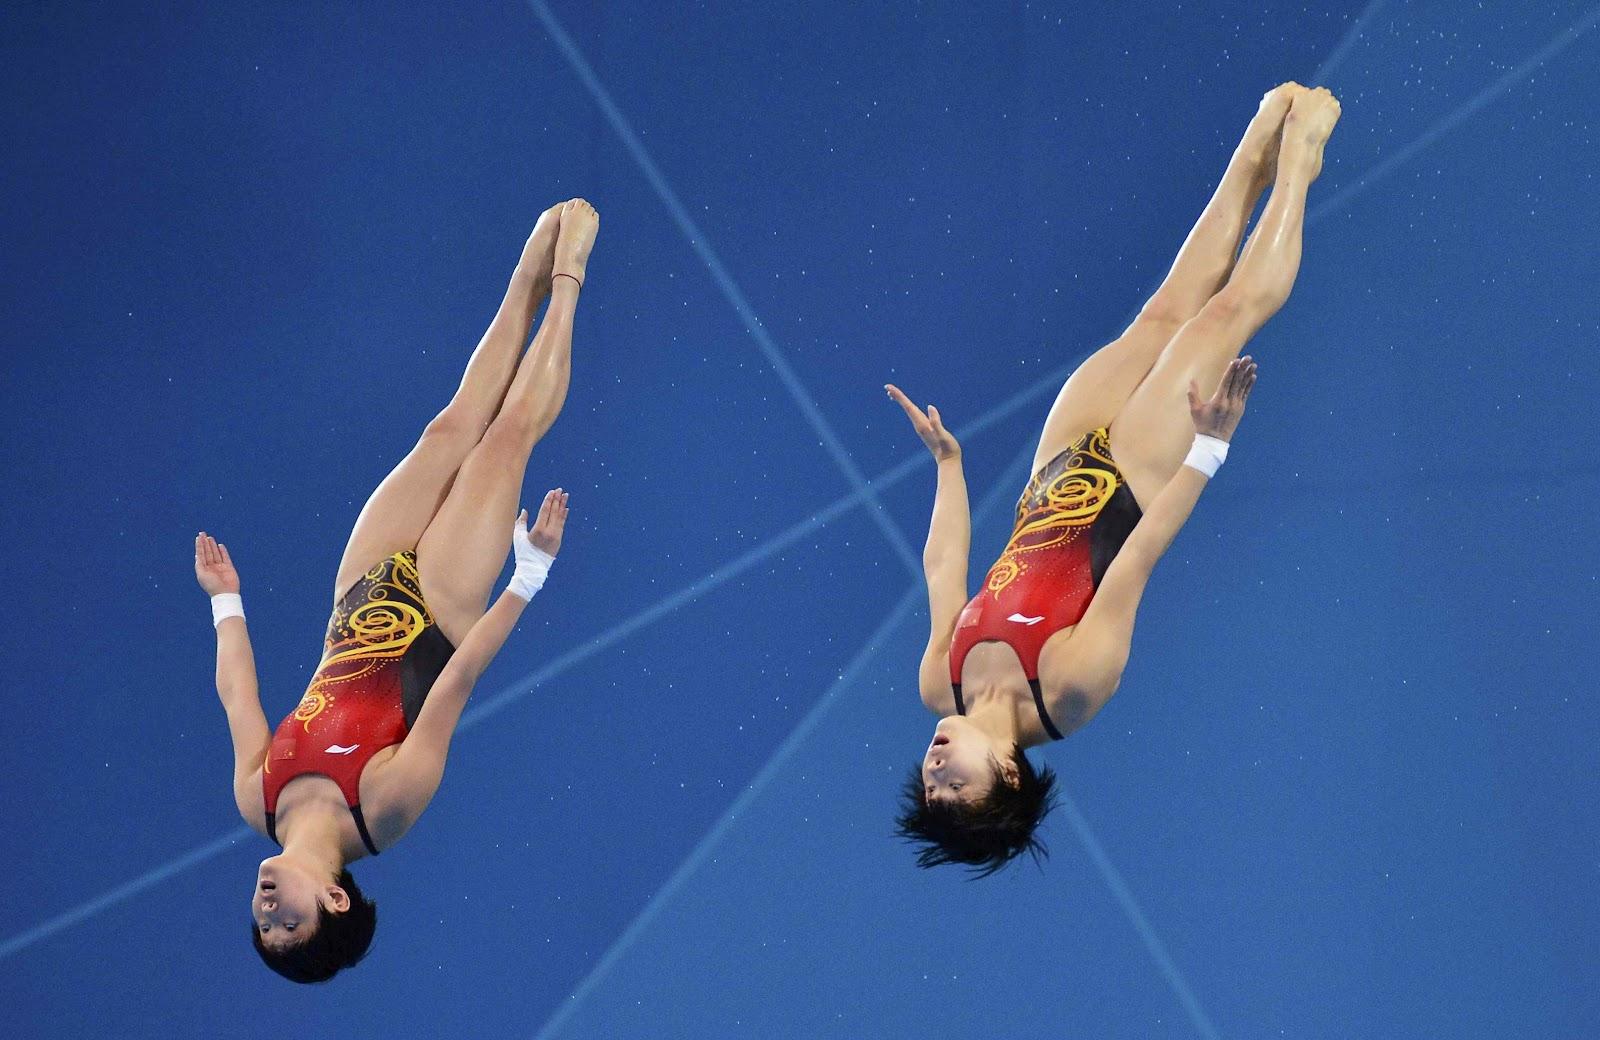 K Chen T Bingen divers 2012 olympic 10m synchronized diving